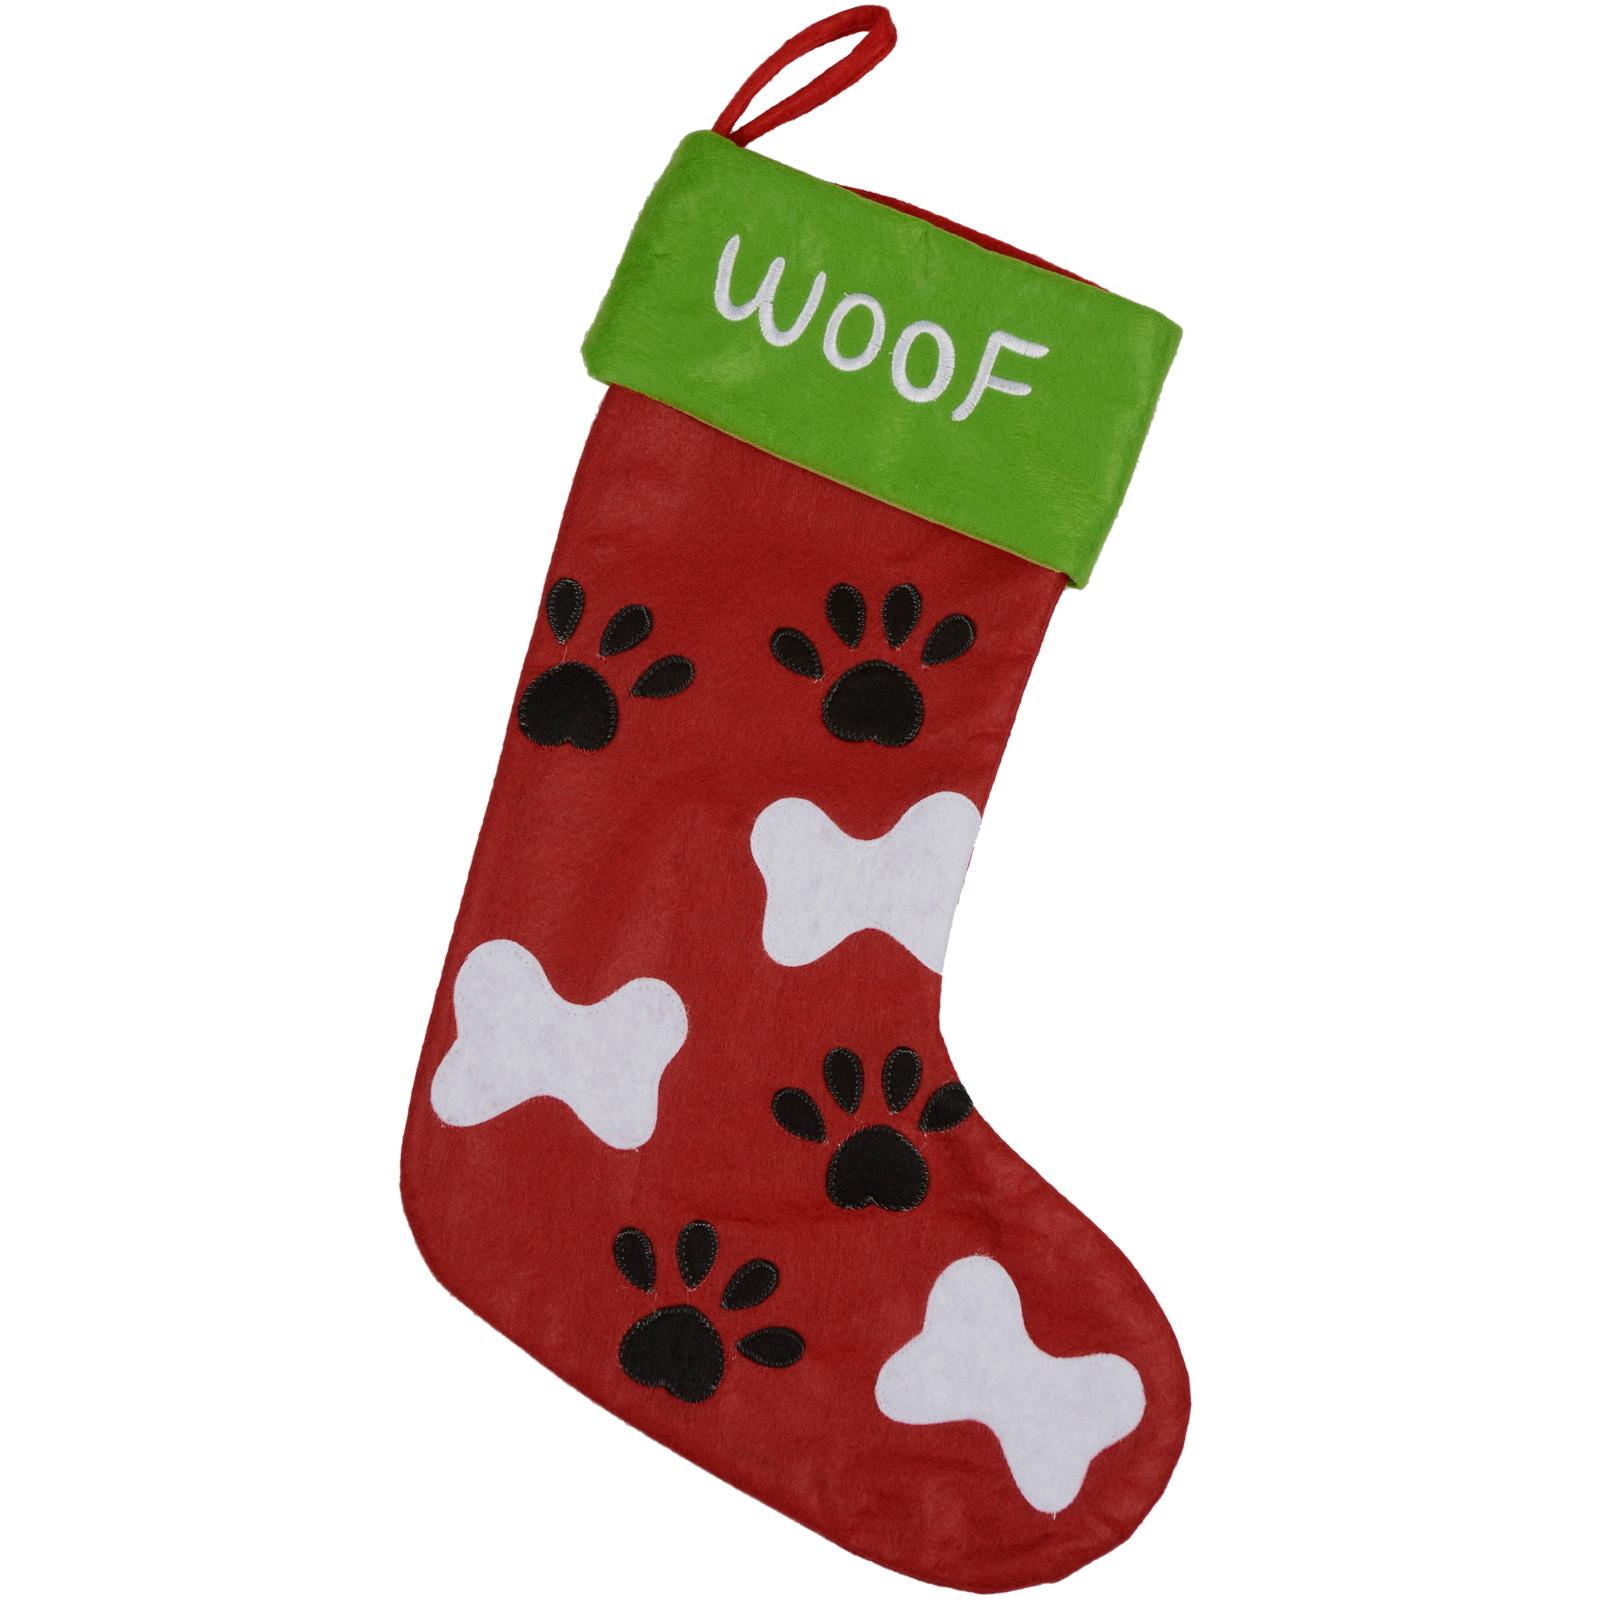 Felt pet christmas stocking with bones paw prints design